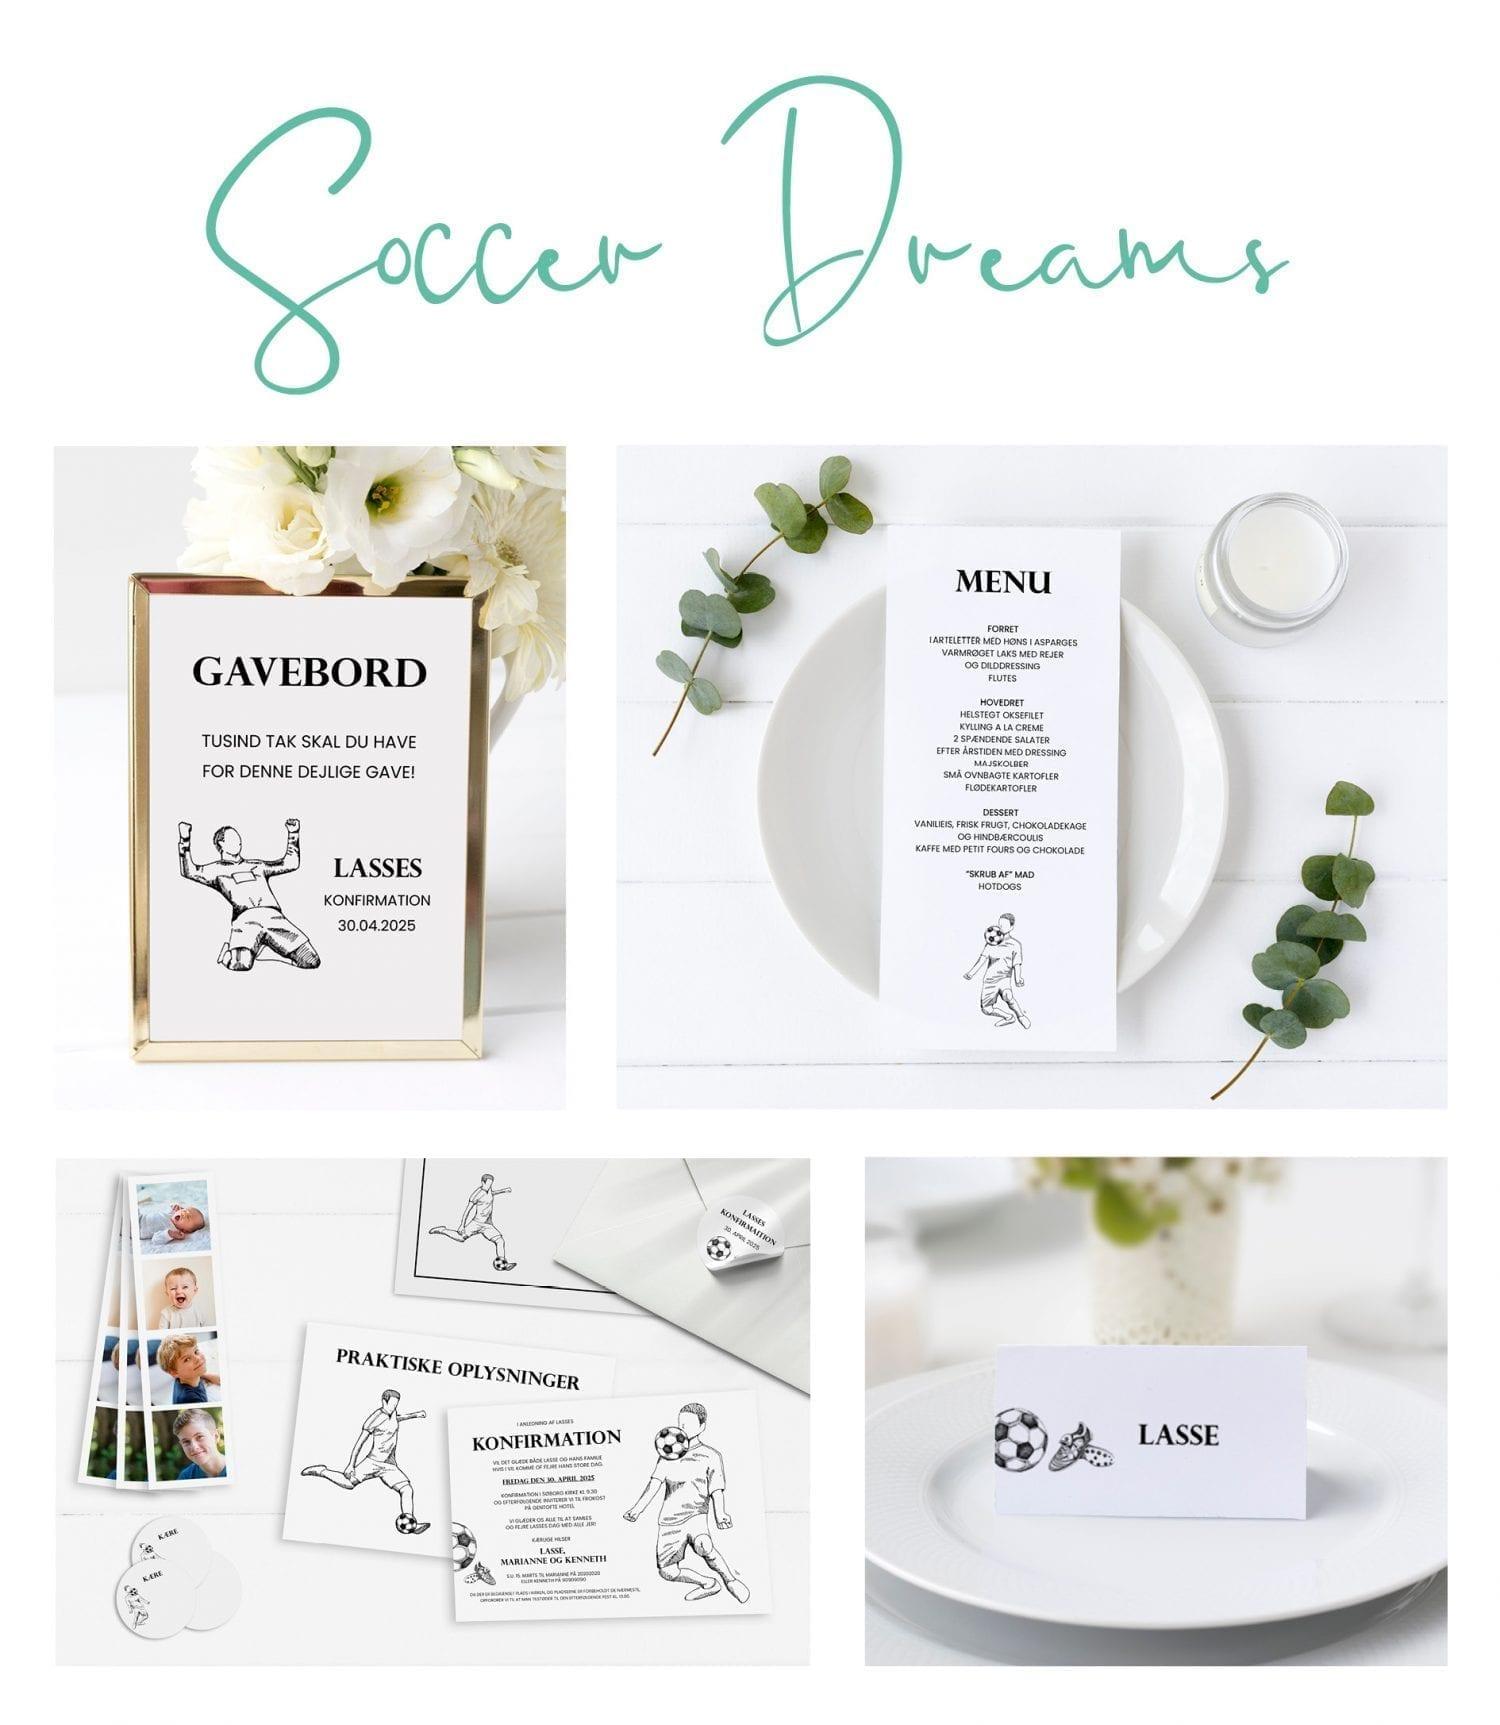 soccer dreams serie - Se hele udvalget